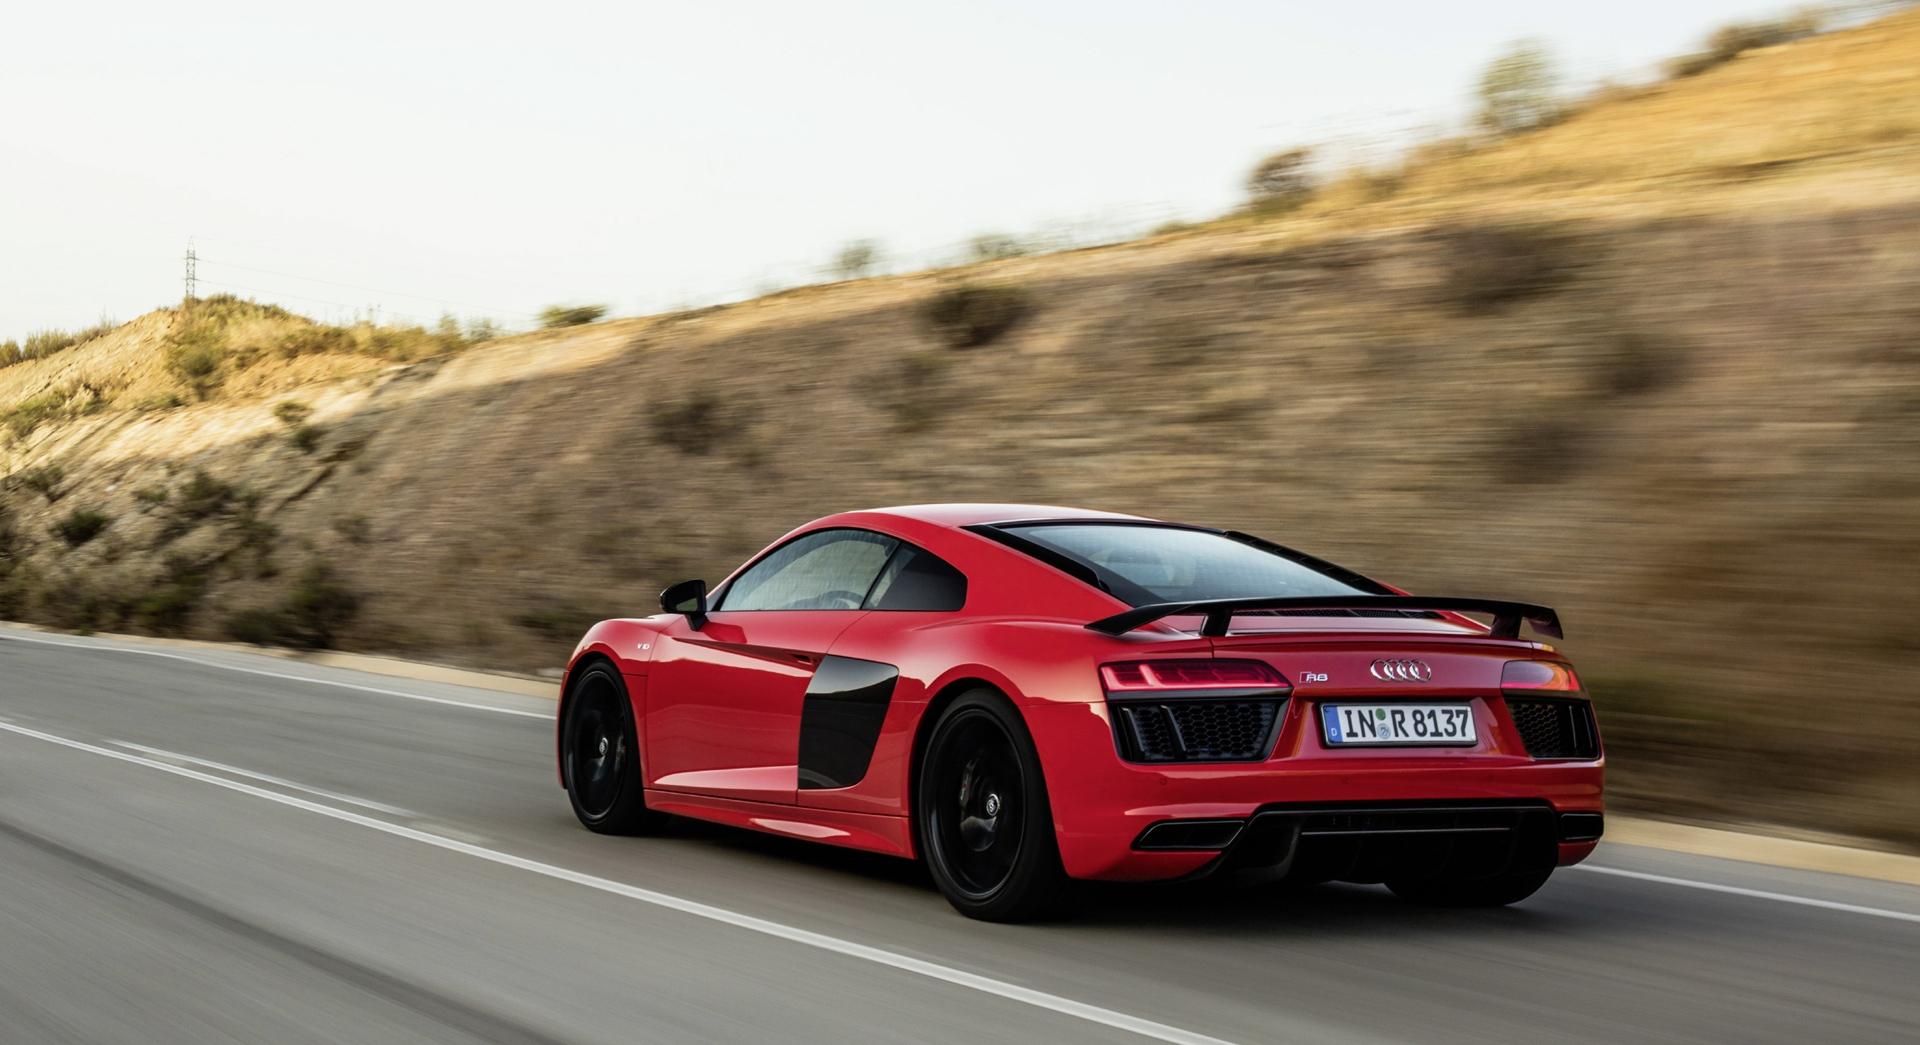 Audi R8 V10 Plus Red Road Hd Desktop Wallpapers 4k Hd